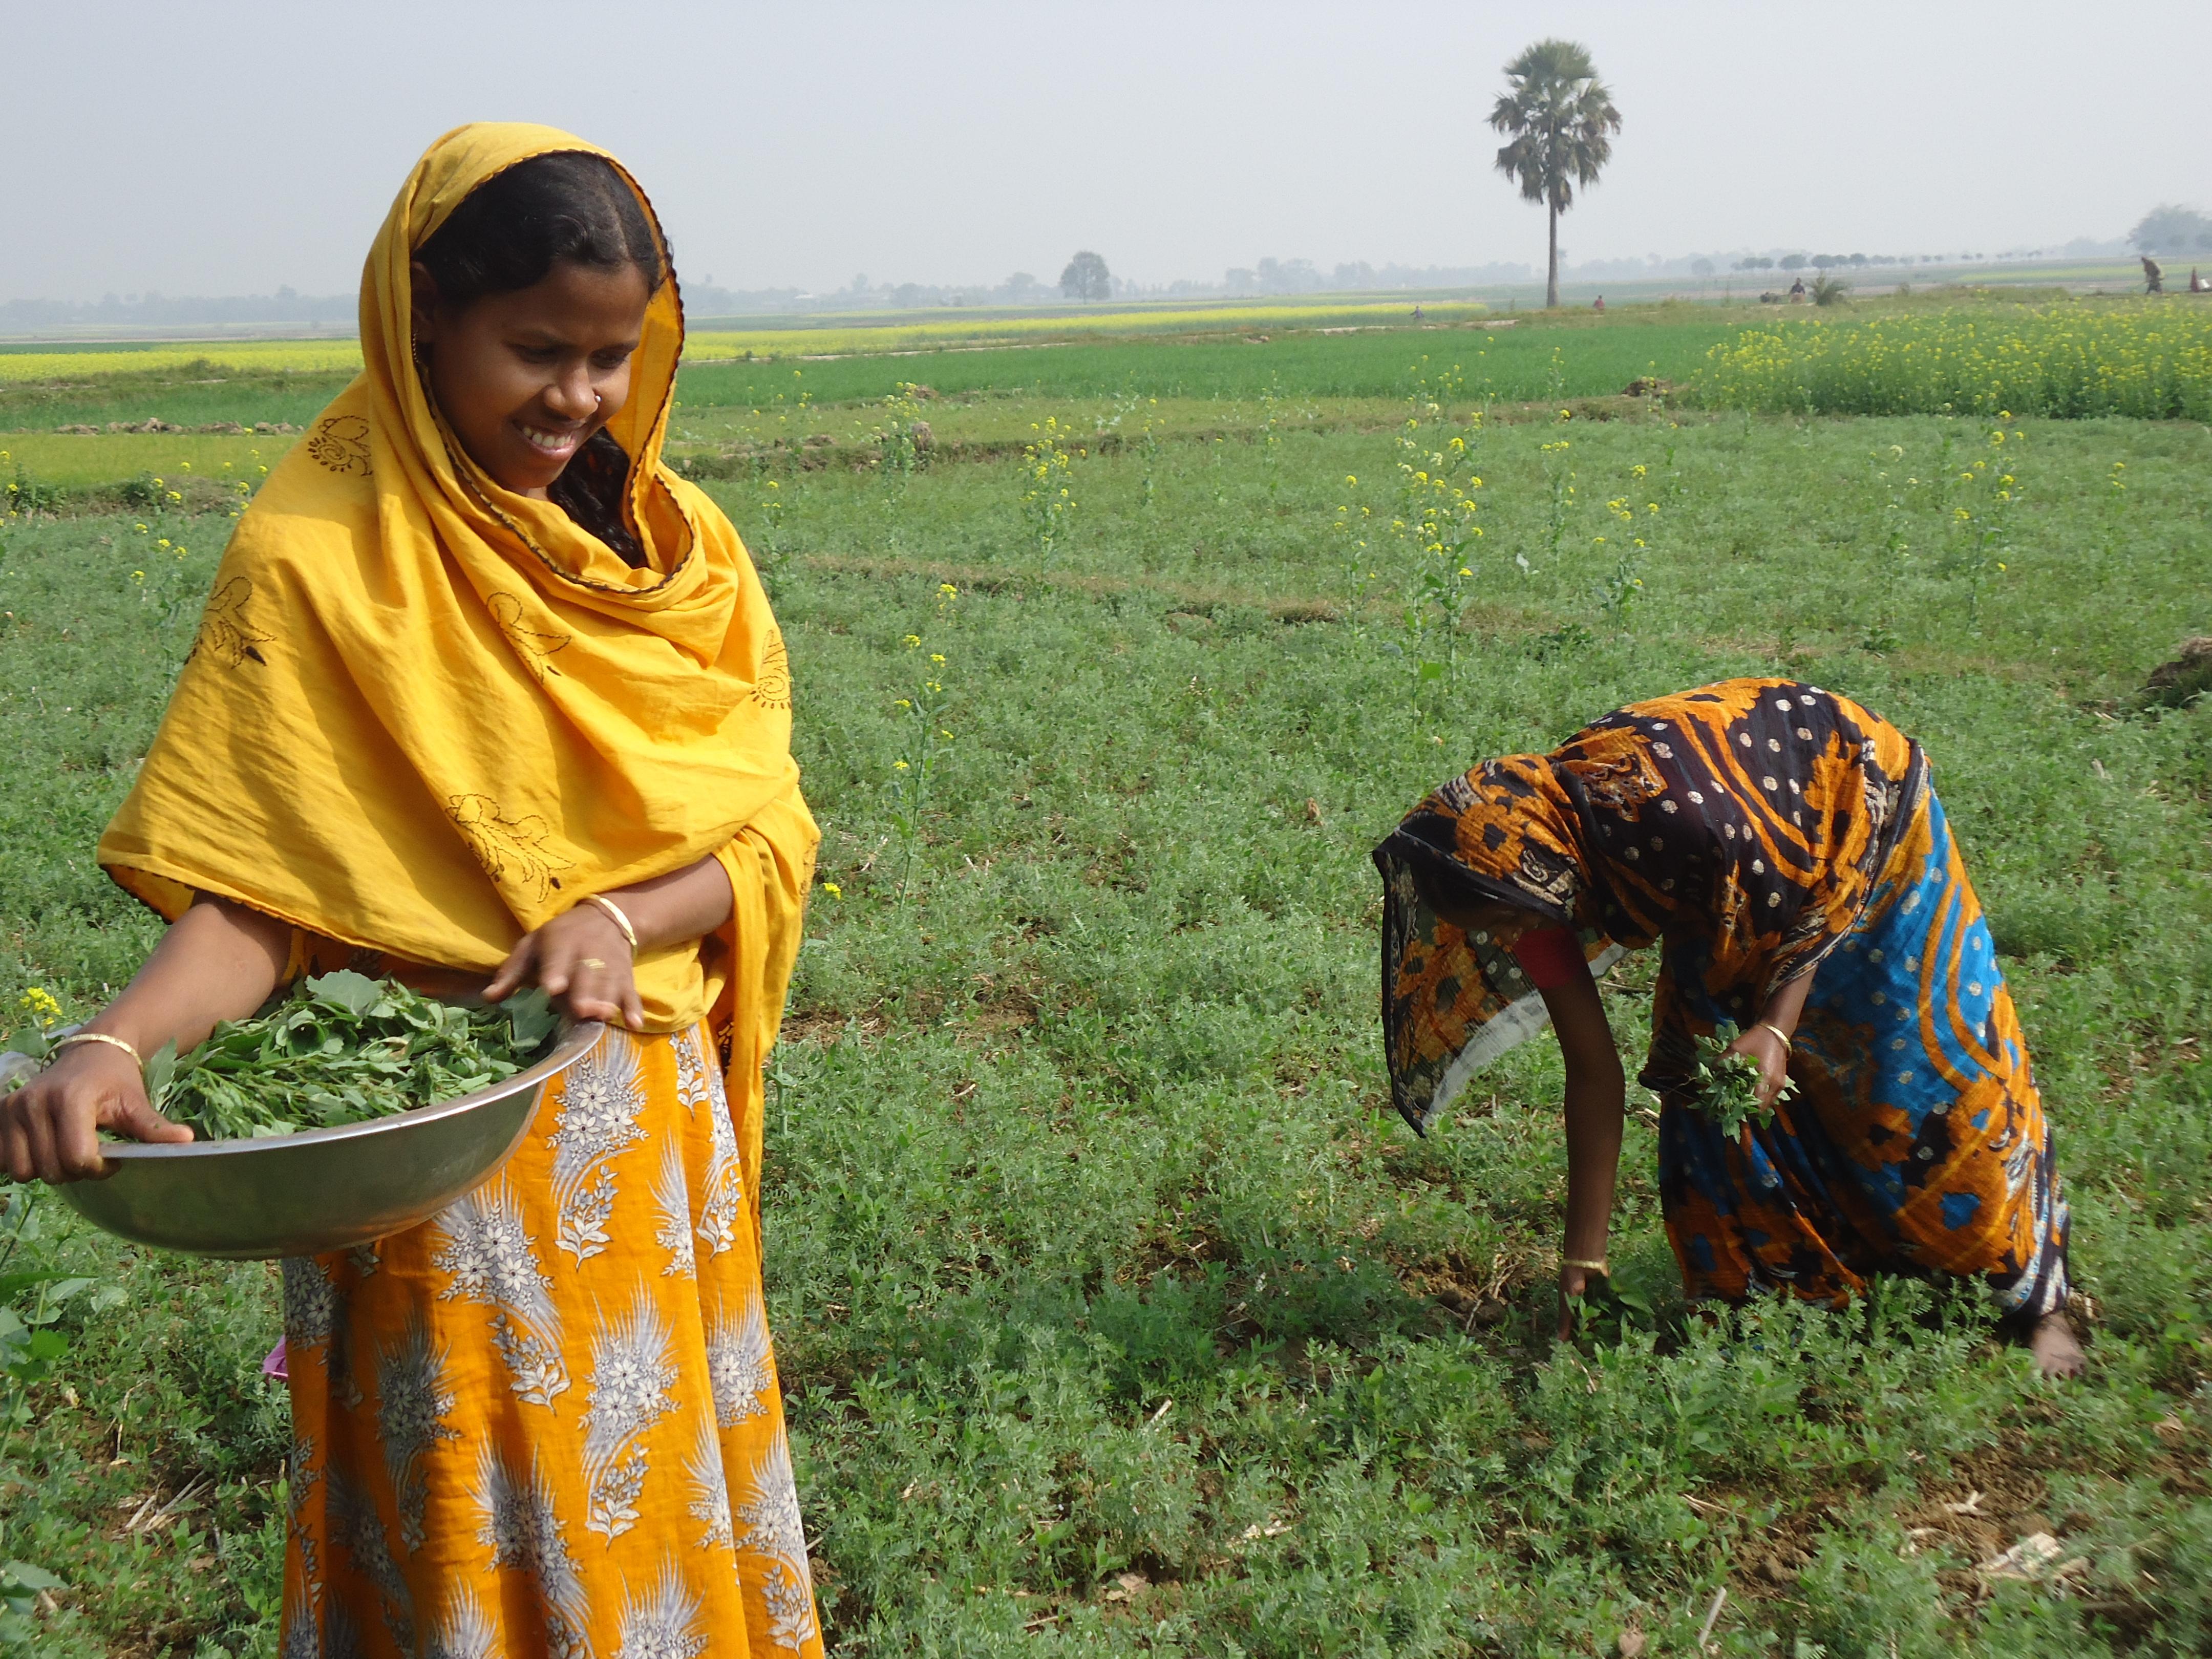 Microfinance Loans Are The New Hope For Women In Kolkata